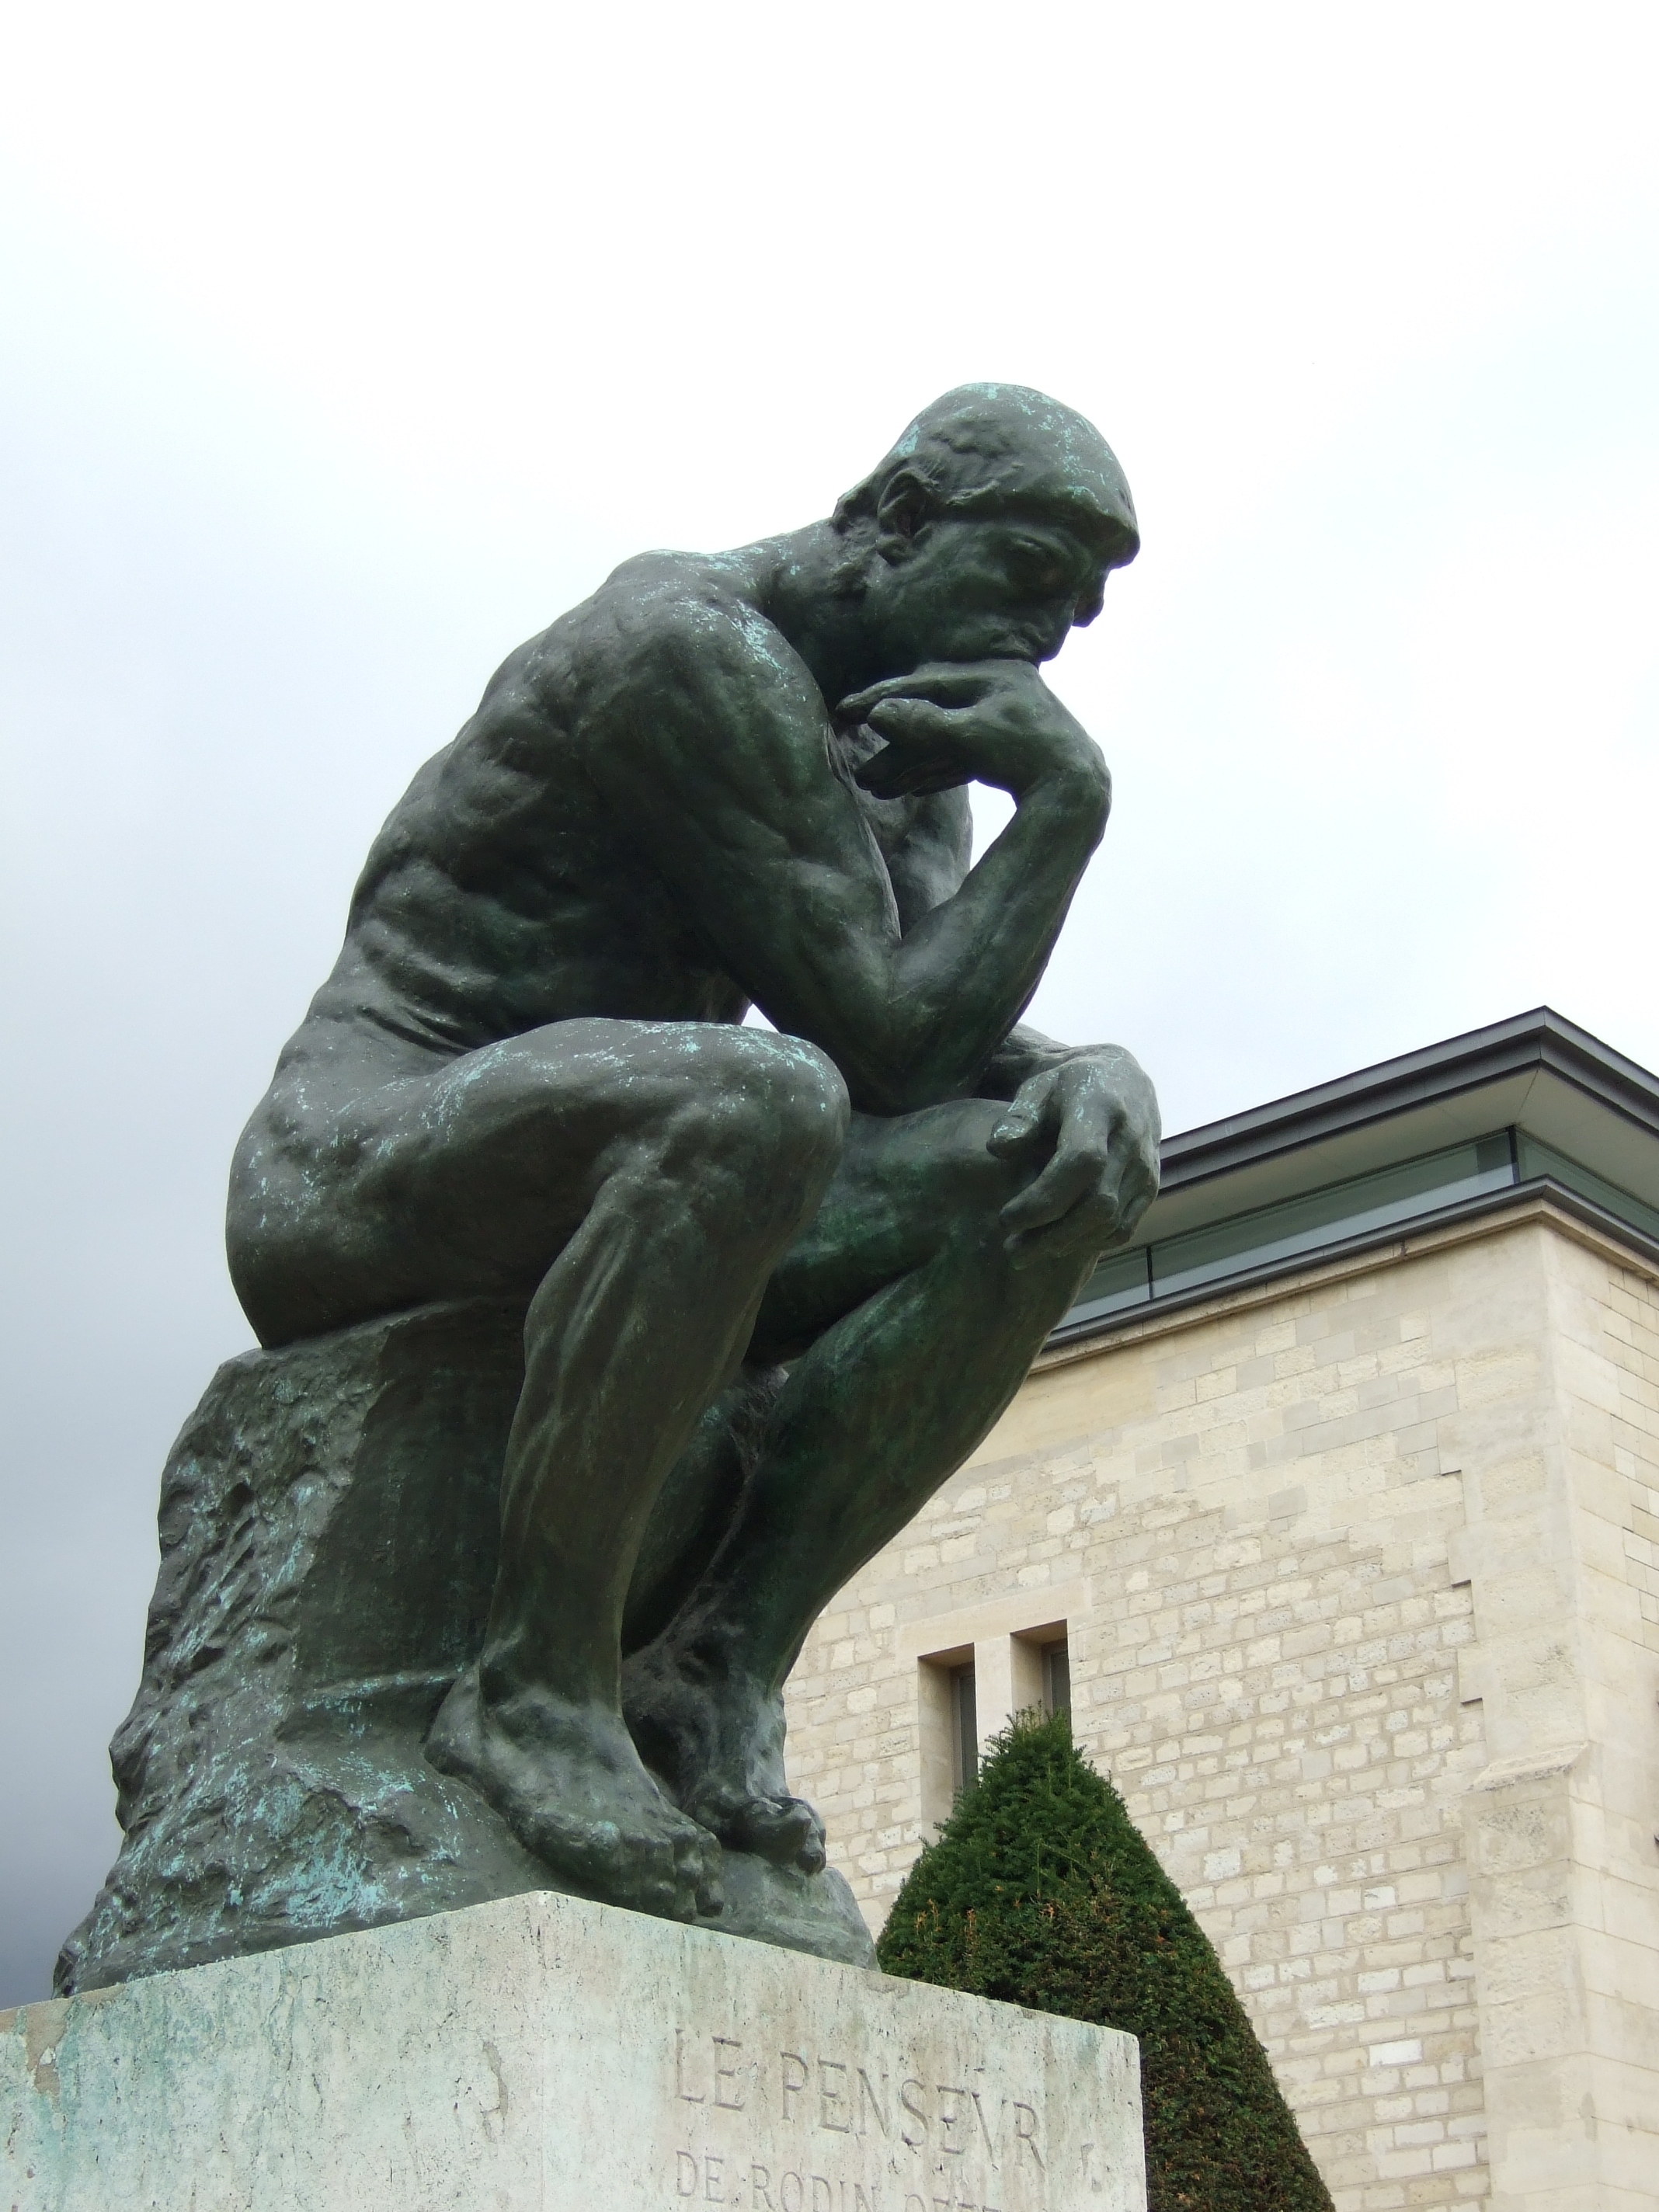 Favori File:LE PENSEUR - Museo Rodin- PARIS.jpg - Wikimedia Commons AW15